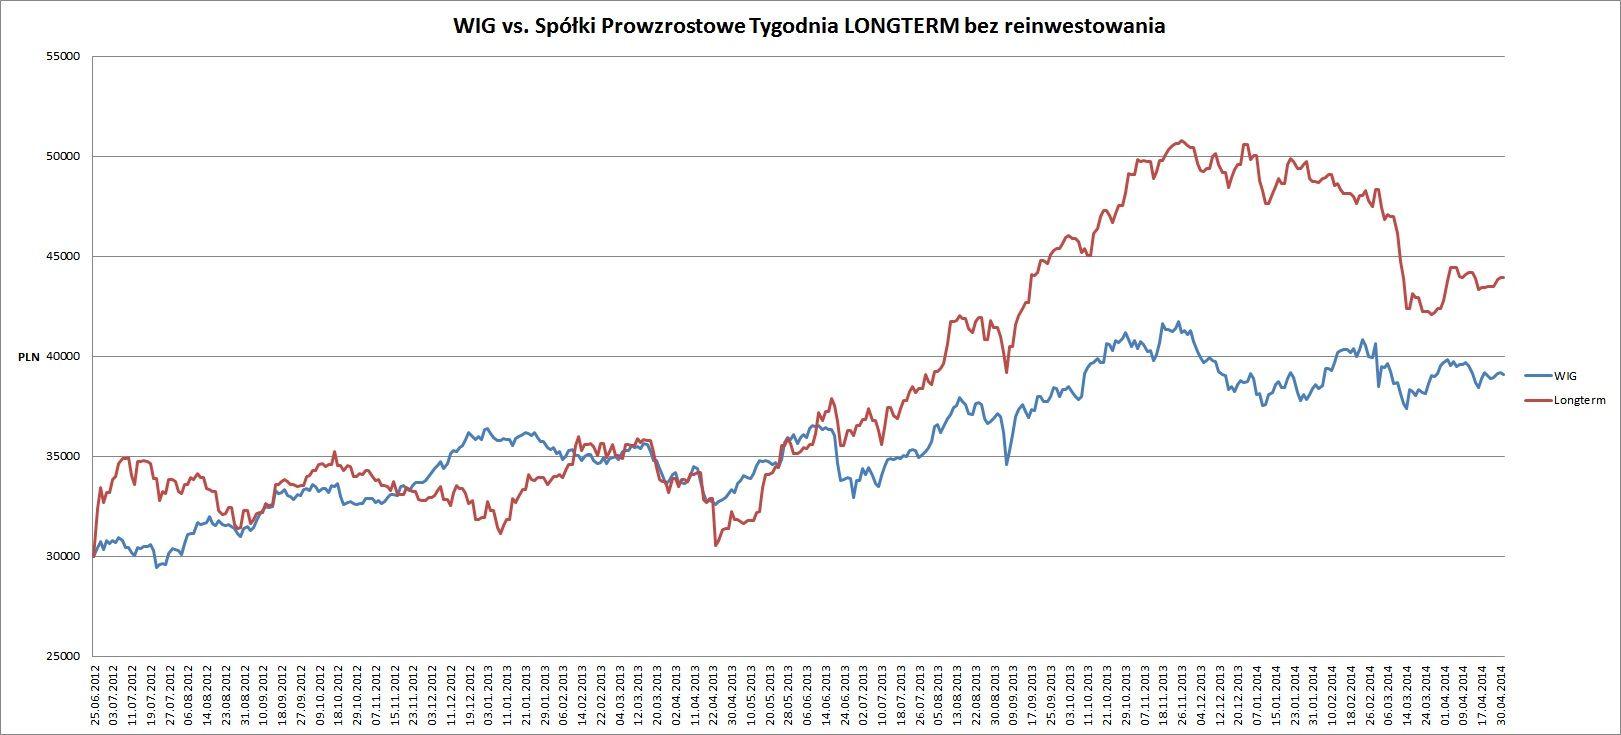 Long Vs WIG 06.05.2014